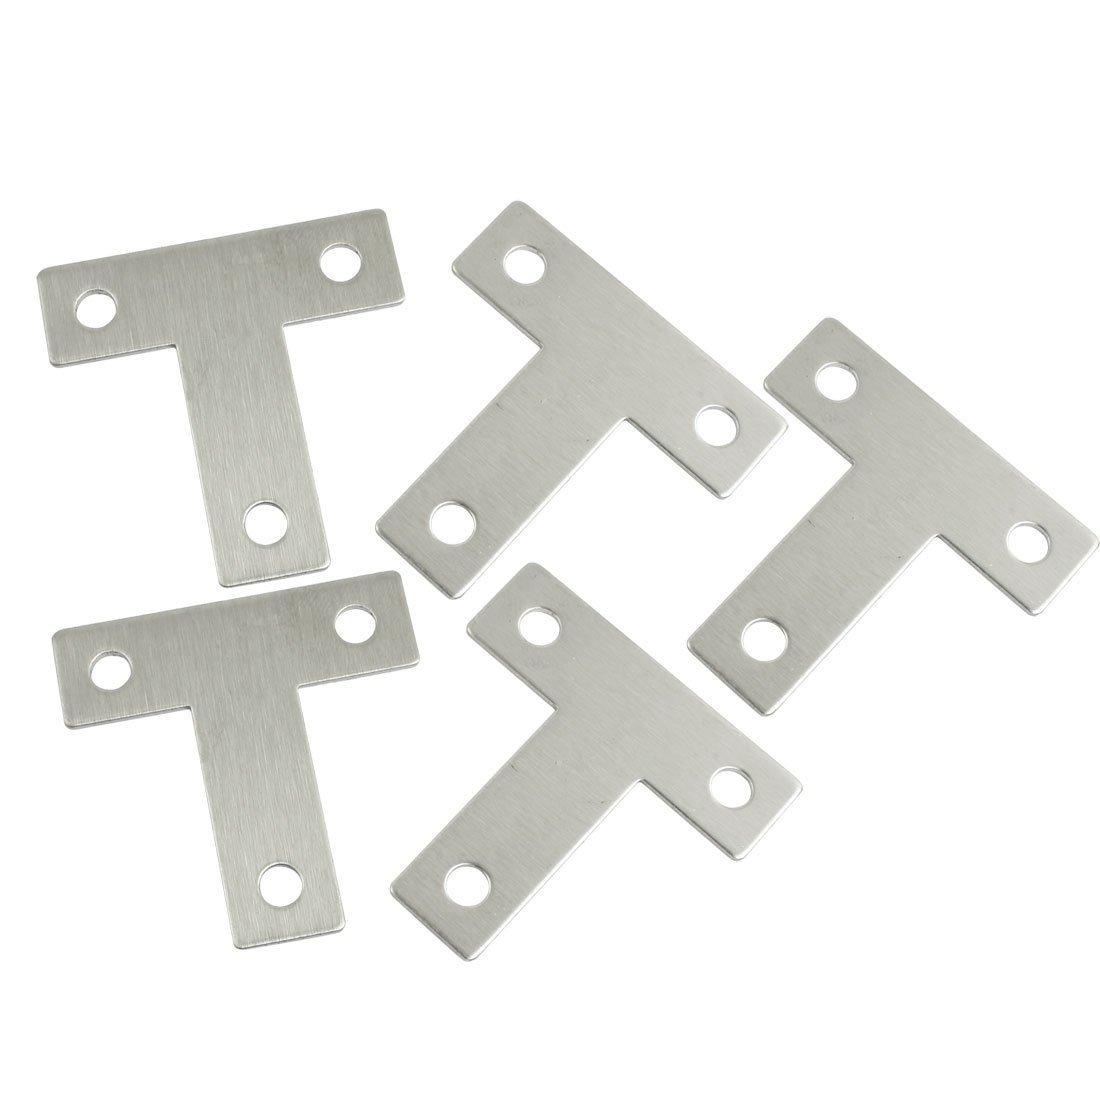 uxcell 5 Pcs Angle Plate Corner Brace Flat T Shape Repair Bracket 40mm x 40mm a13022500ux0169